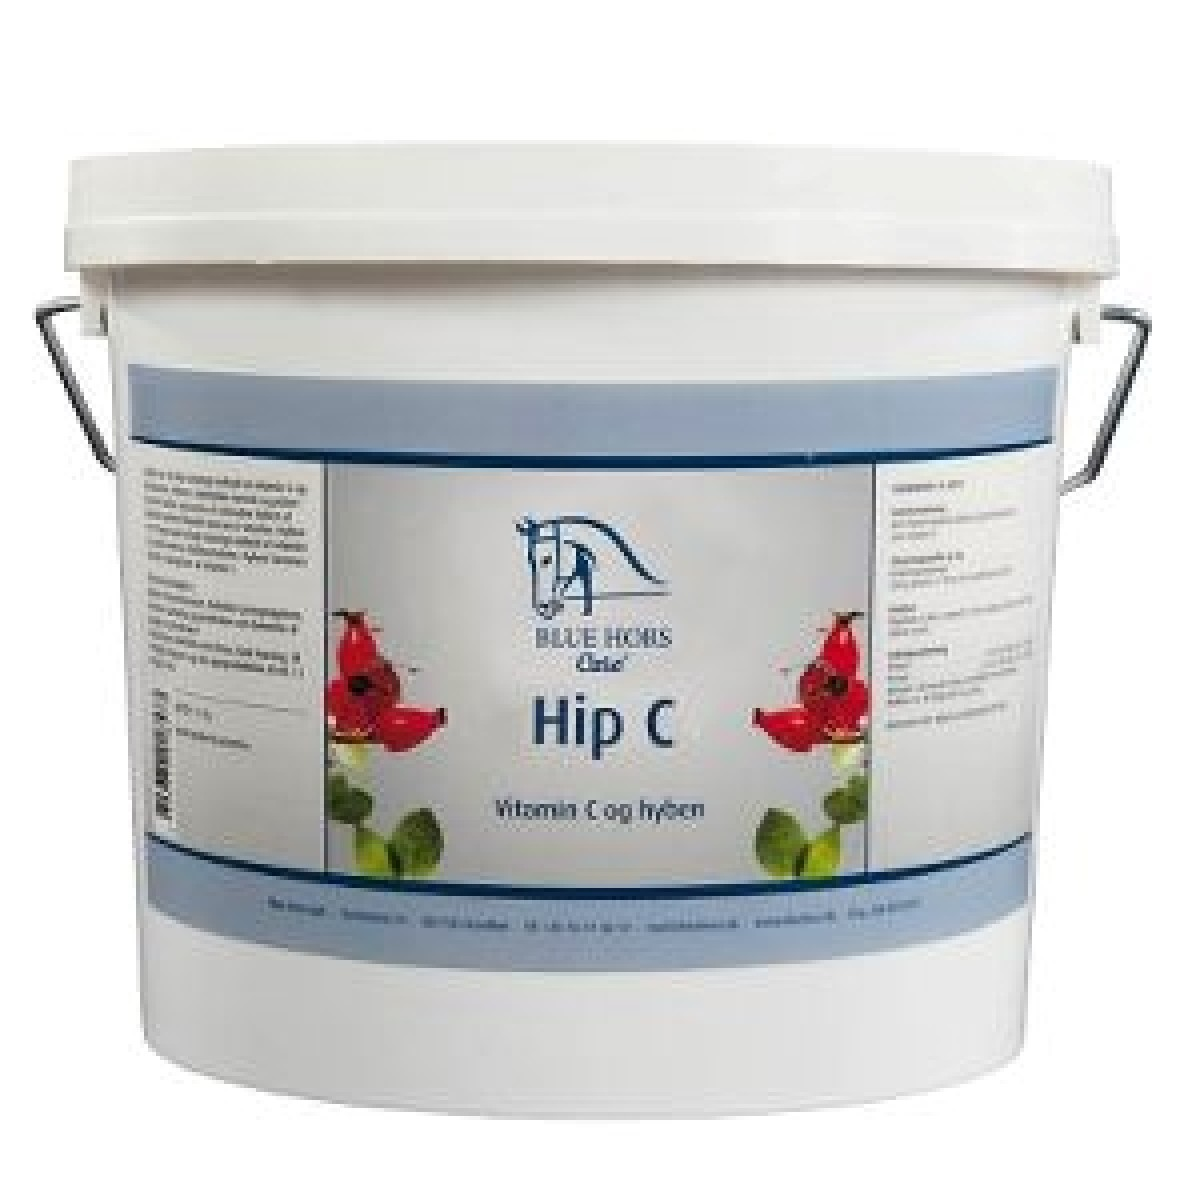 Blue Hors Hip C